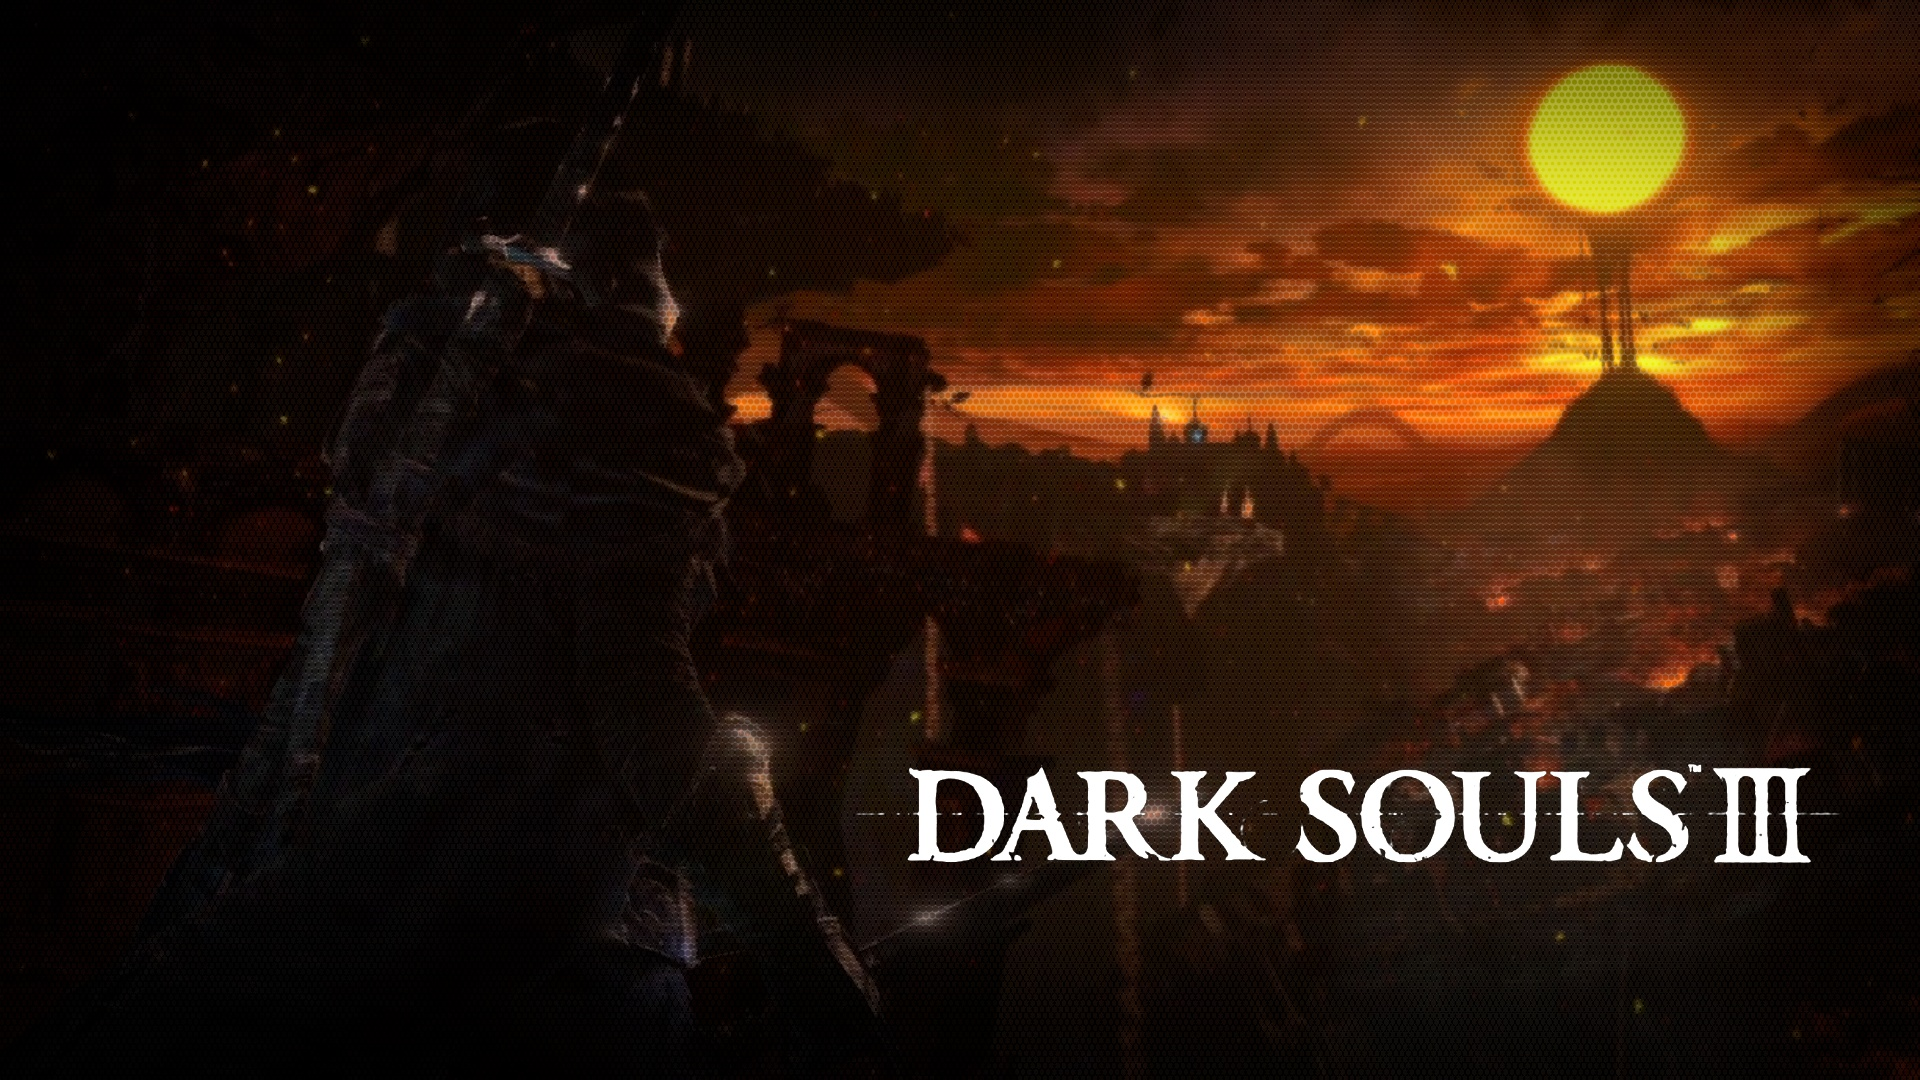 dark souls 3 wallpaper 1080p - photo #32